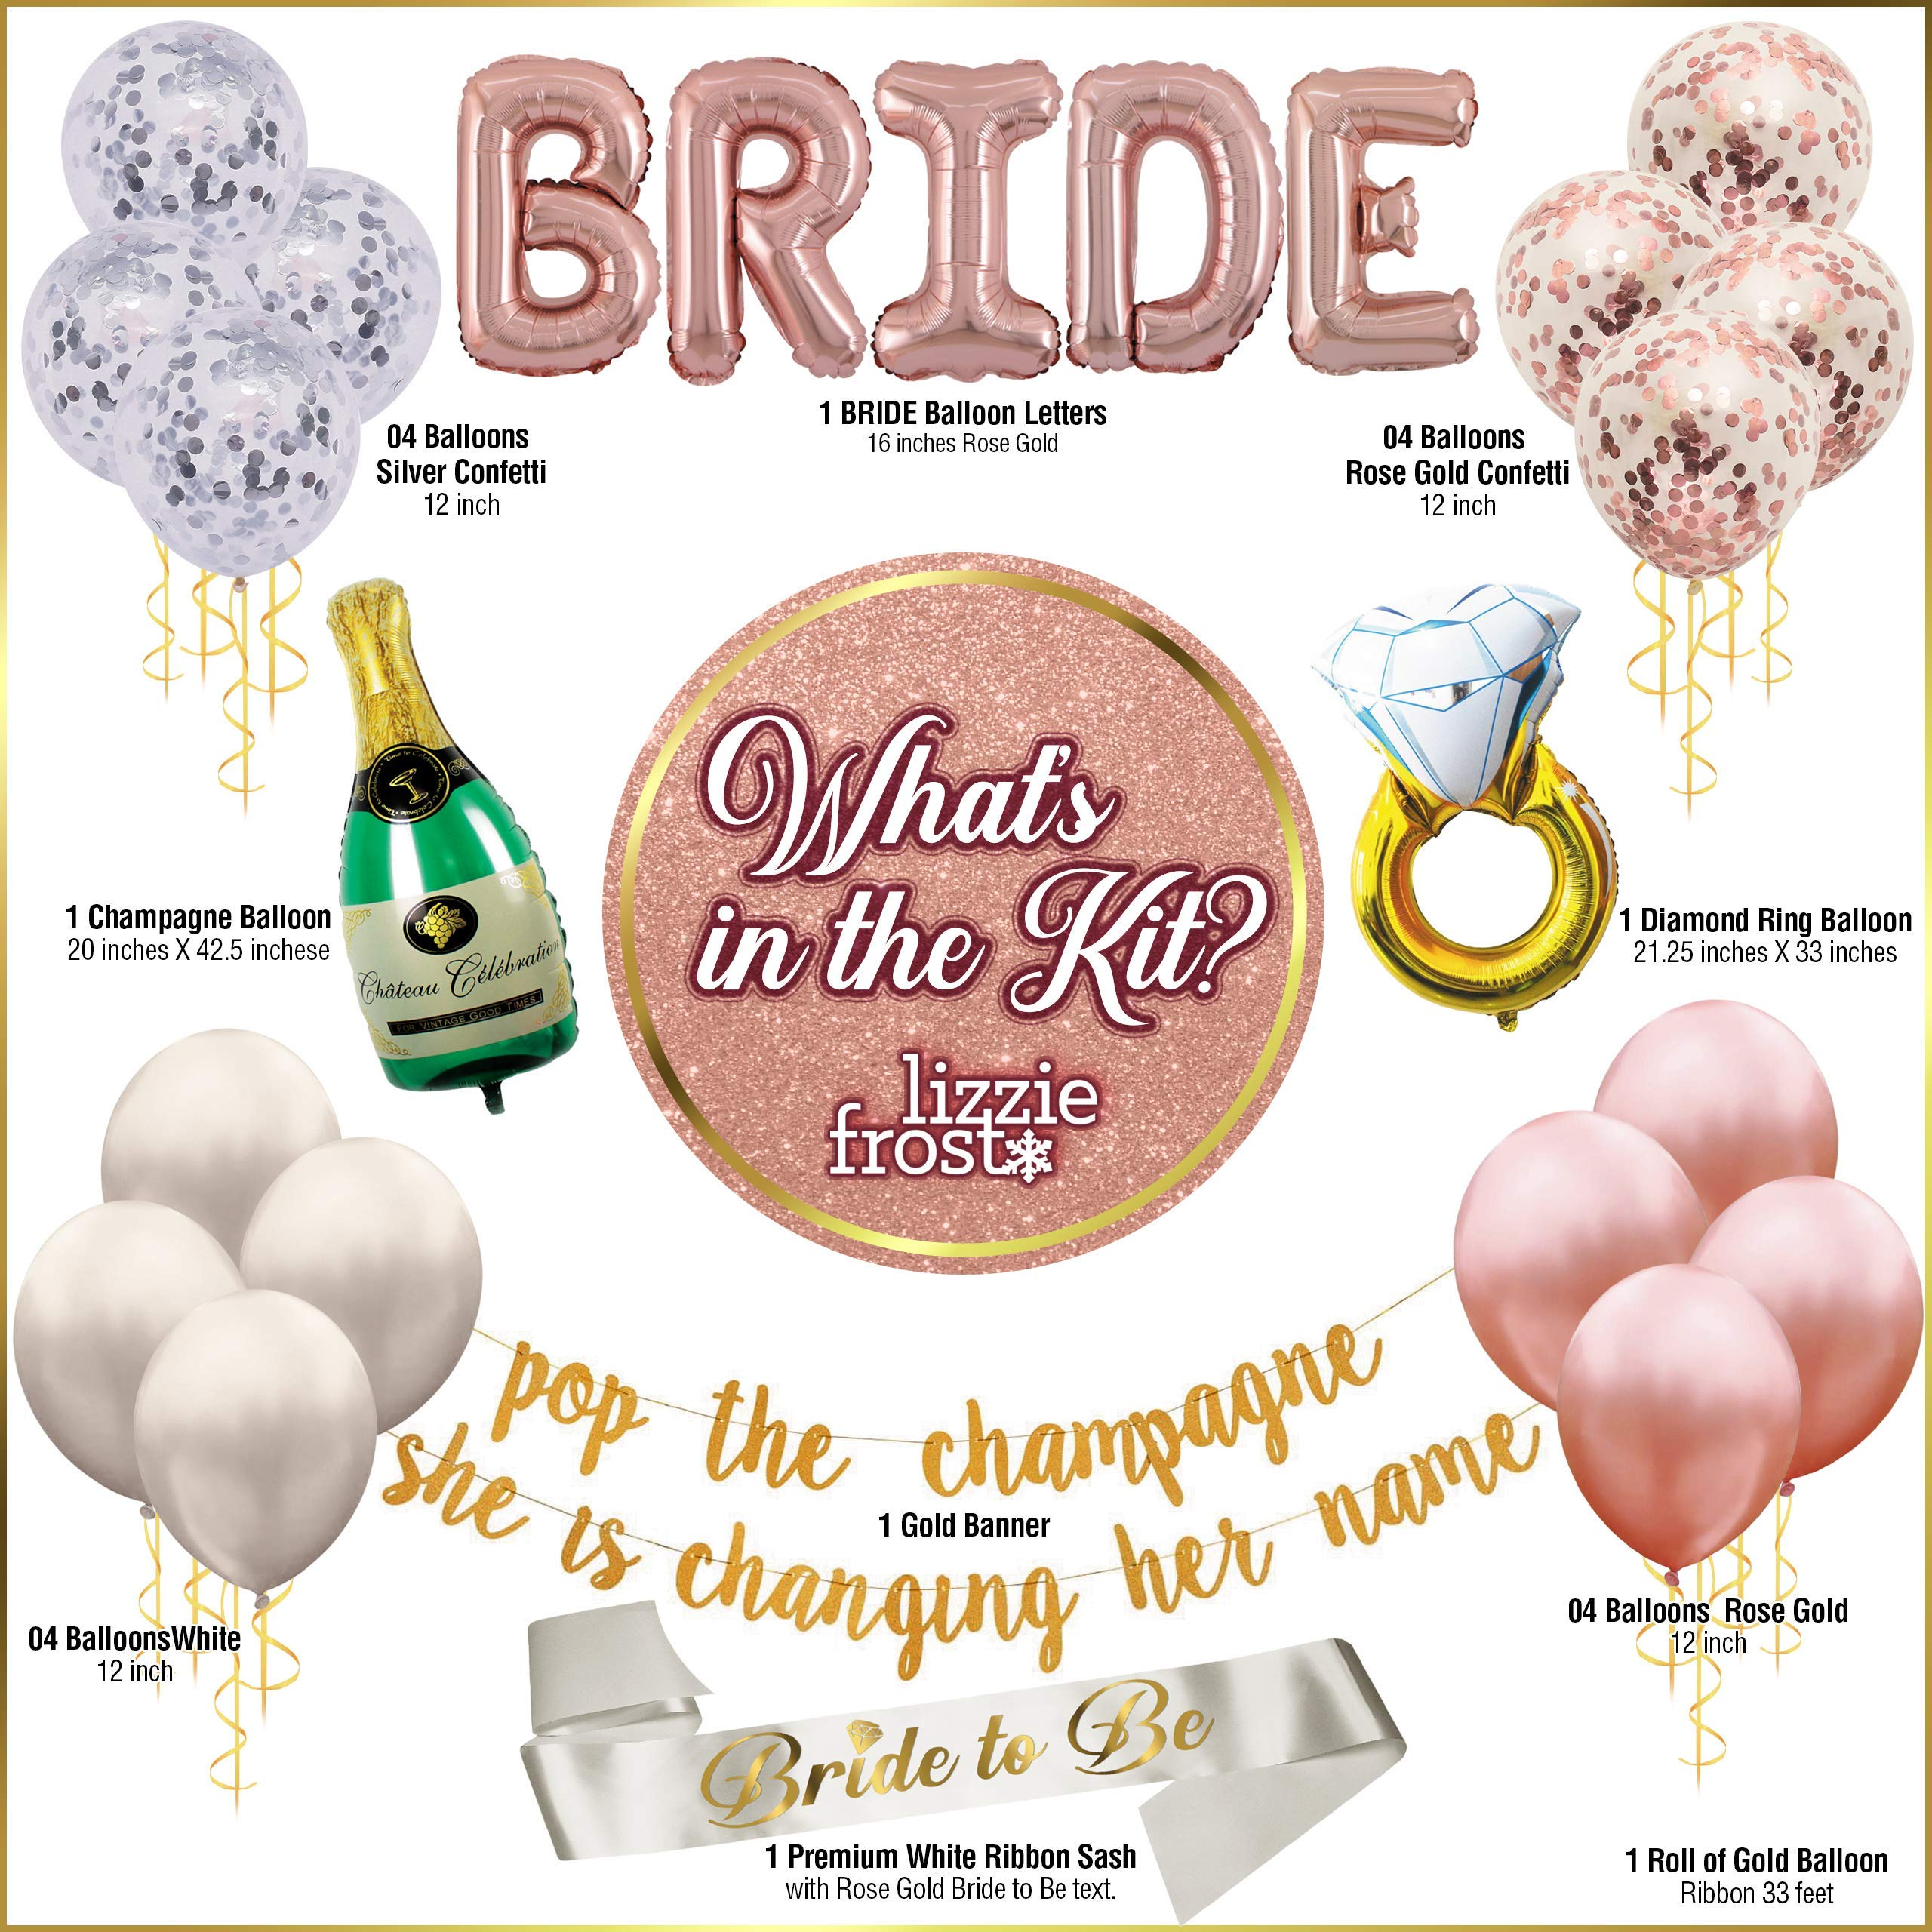 Bachelorette Party Decorations - Bridal Shower Supply Kit - Classy Bridal Bundle with Banner, Balloons, Gold Ribbon and Sash - Rose Gold Bride Party Décor - 22 pcs Bachelorette Kit